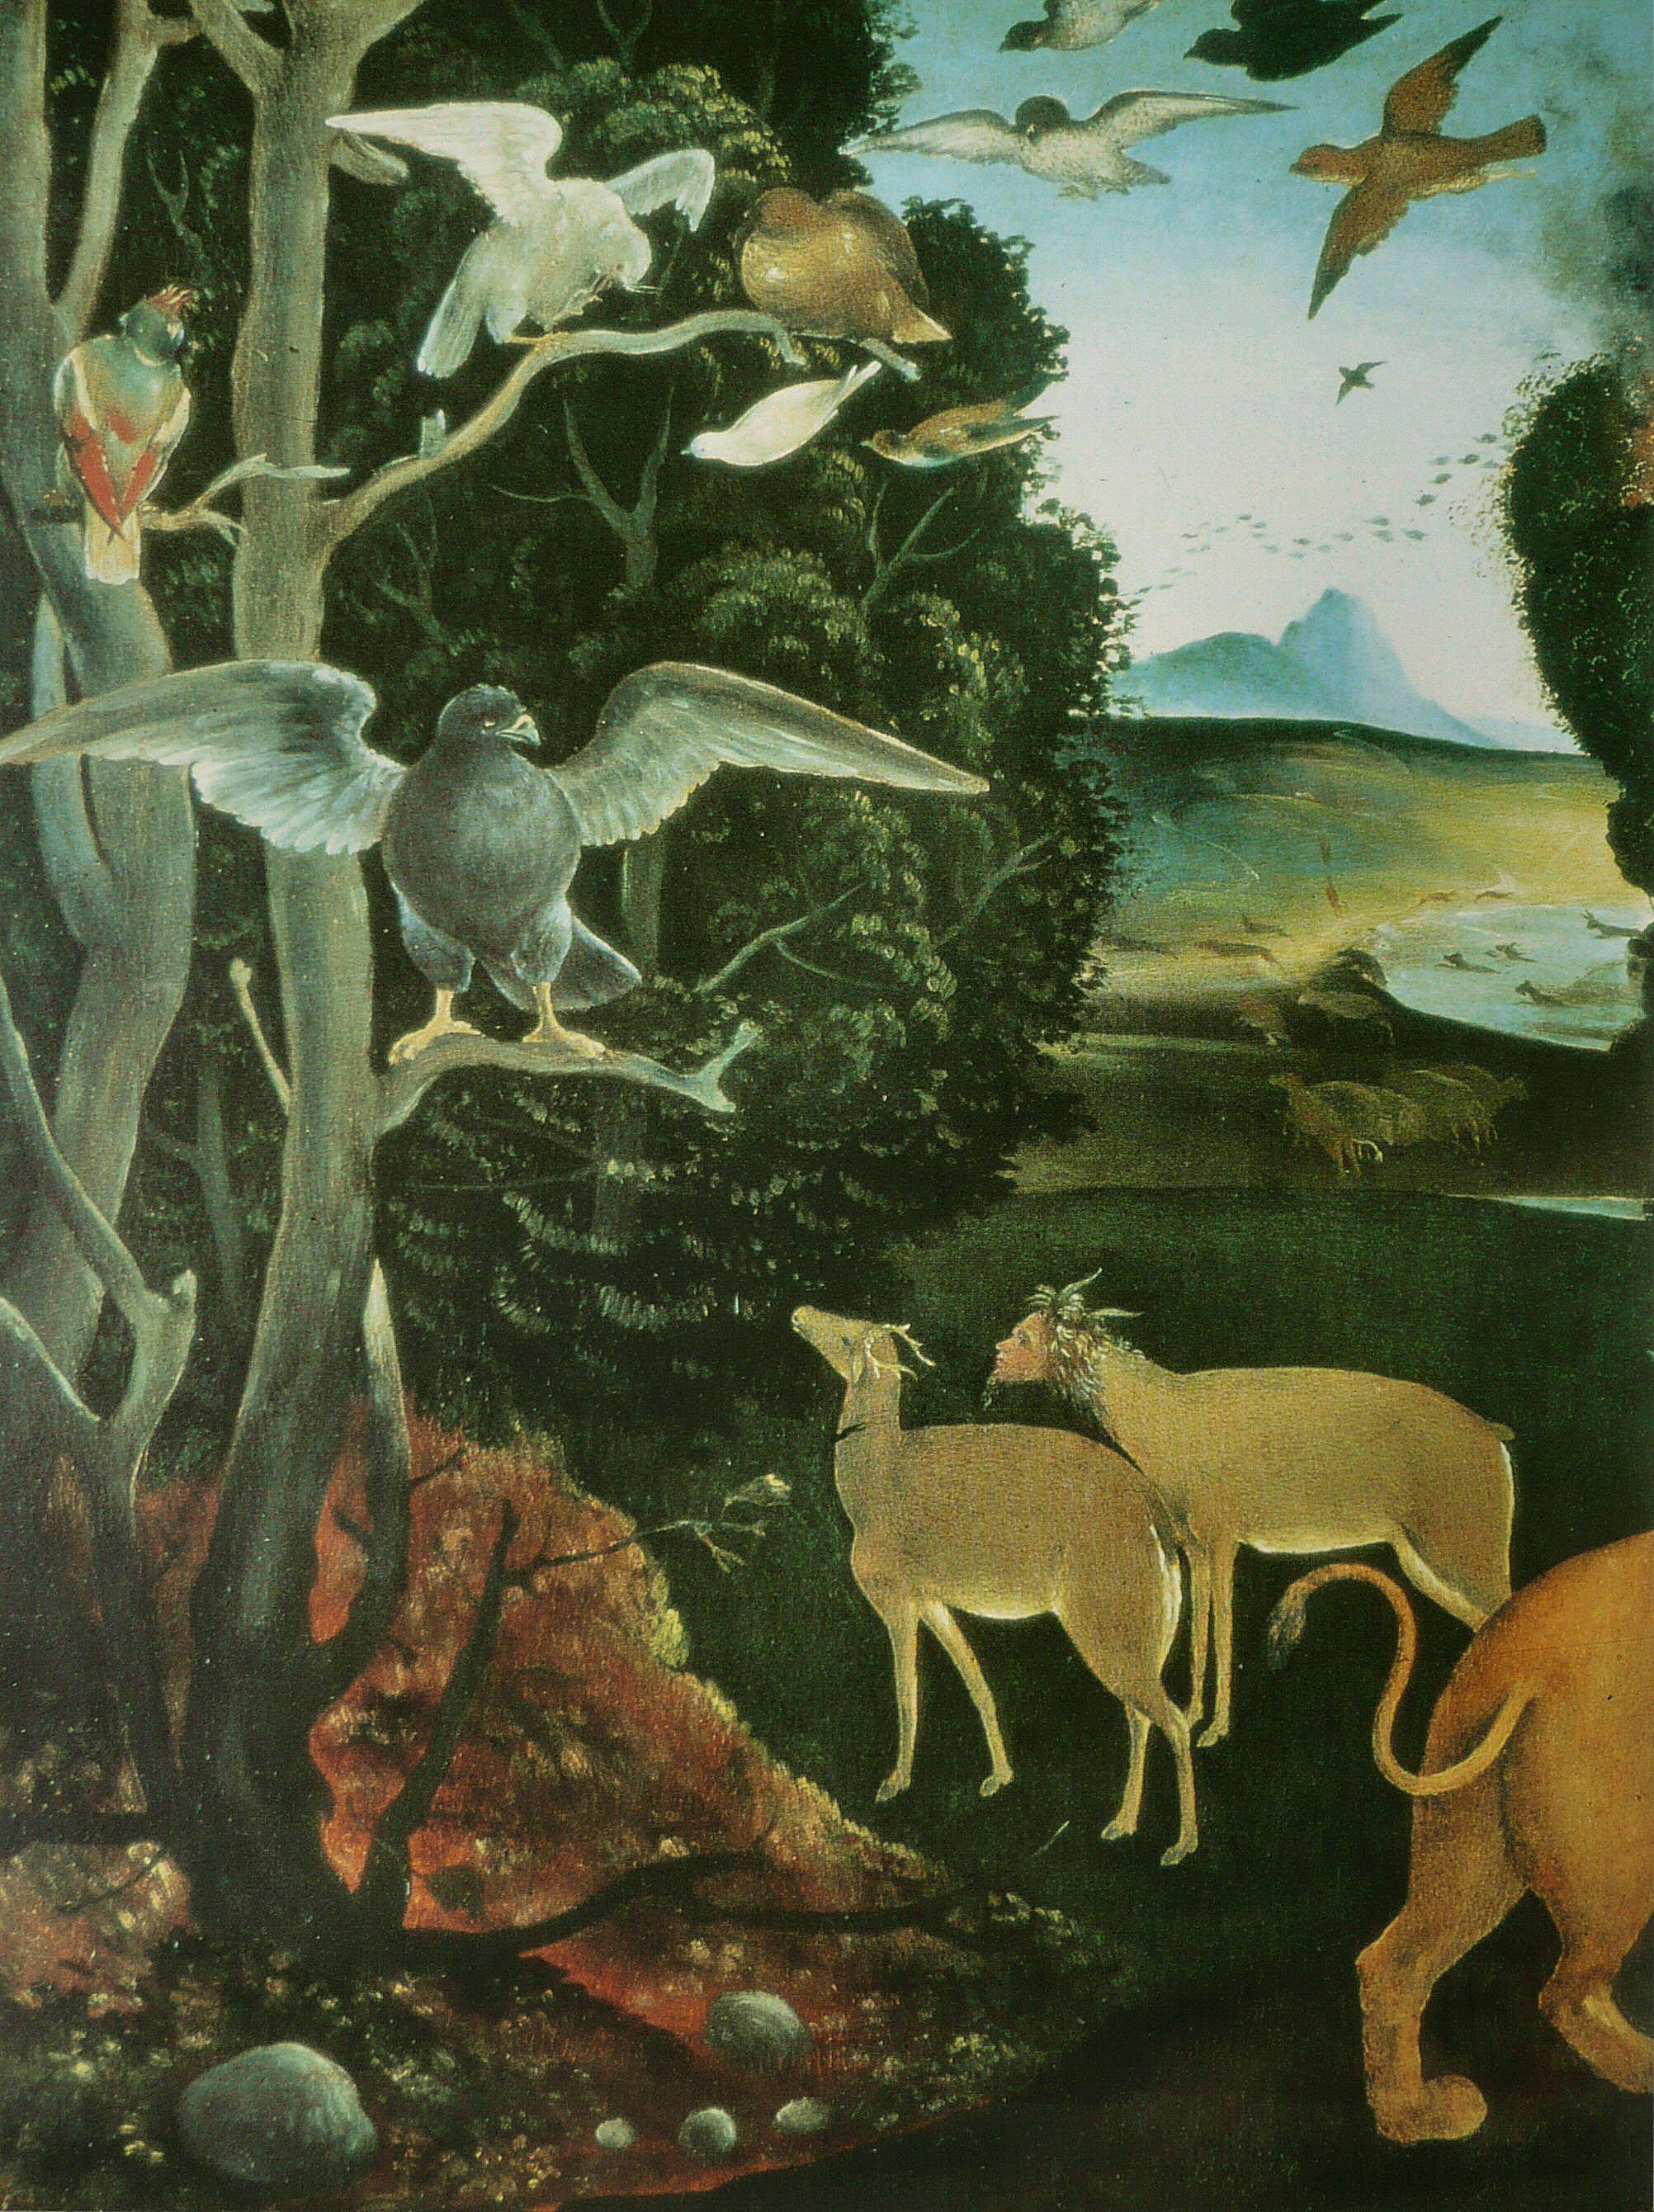 Piero di Cosimo 1505 ca La foret en feu ashmolean museum oxford detail3